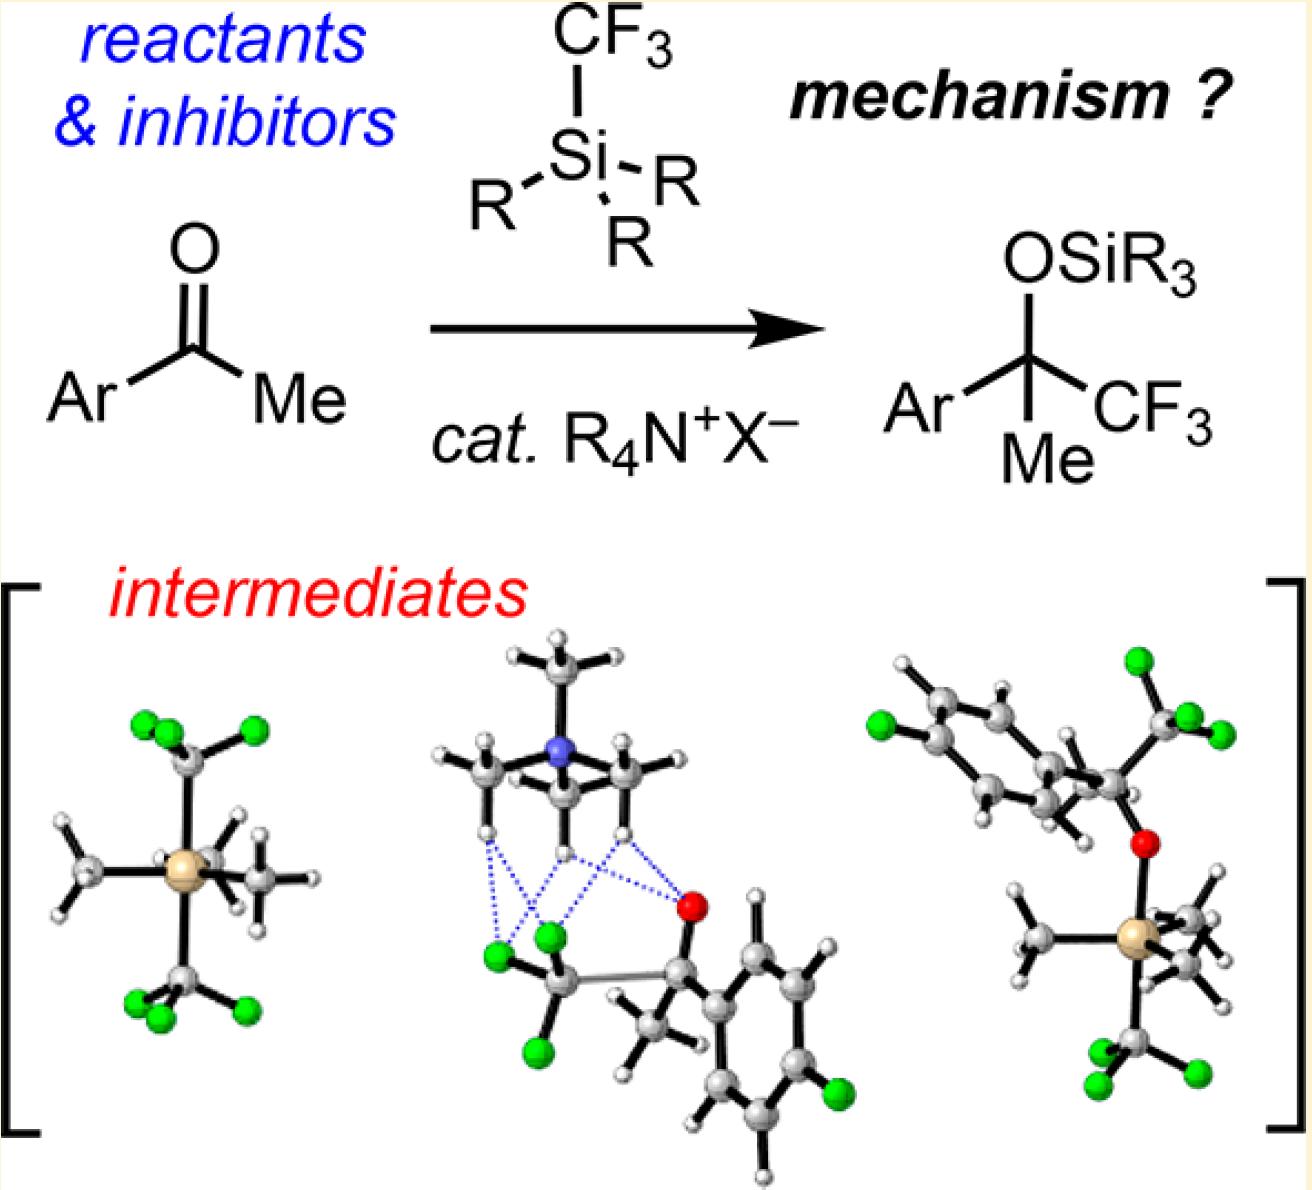 Anion-Initiated Trifluoromethylation by TMSCF3: Deconvolution of the Siliconate-Carbanion Dichotomy by Stopped-Flow NMR/IR - J. Am. Chem. Soc. 2018, In press.